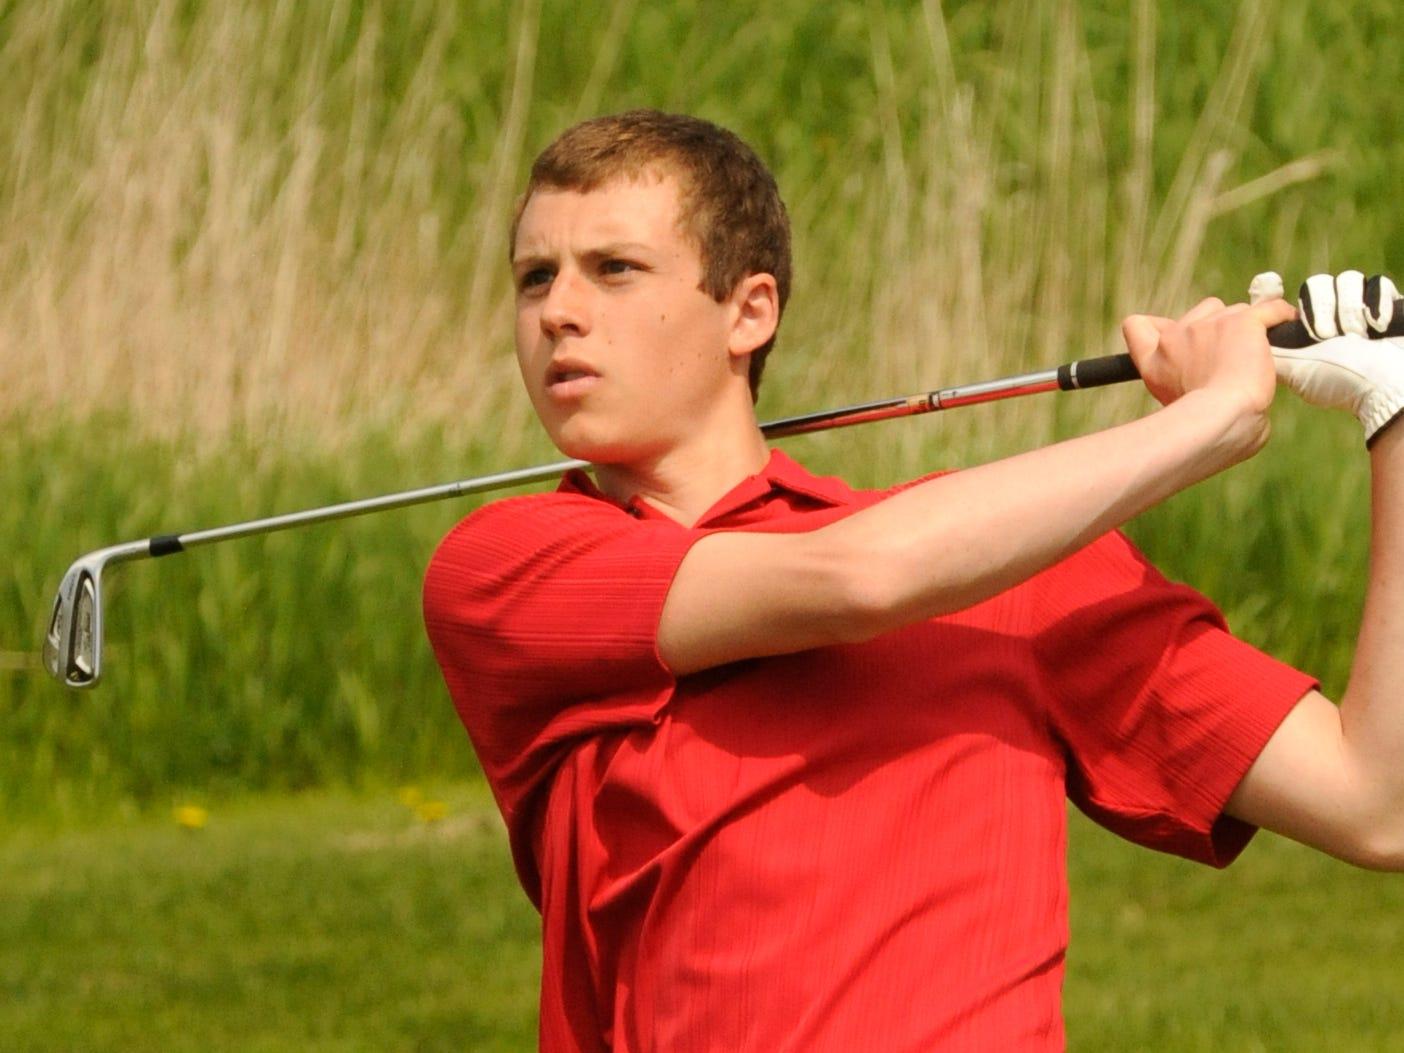 The Roncalli boys golf team return three members of last season's State-qualifying squad, including senior Logan Theisen.